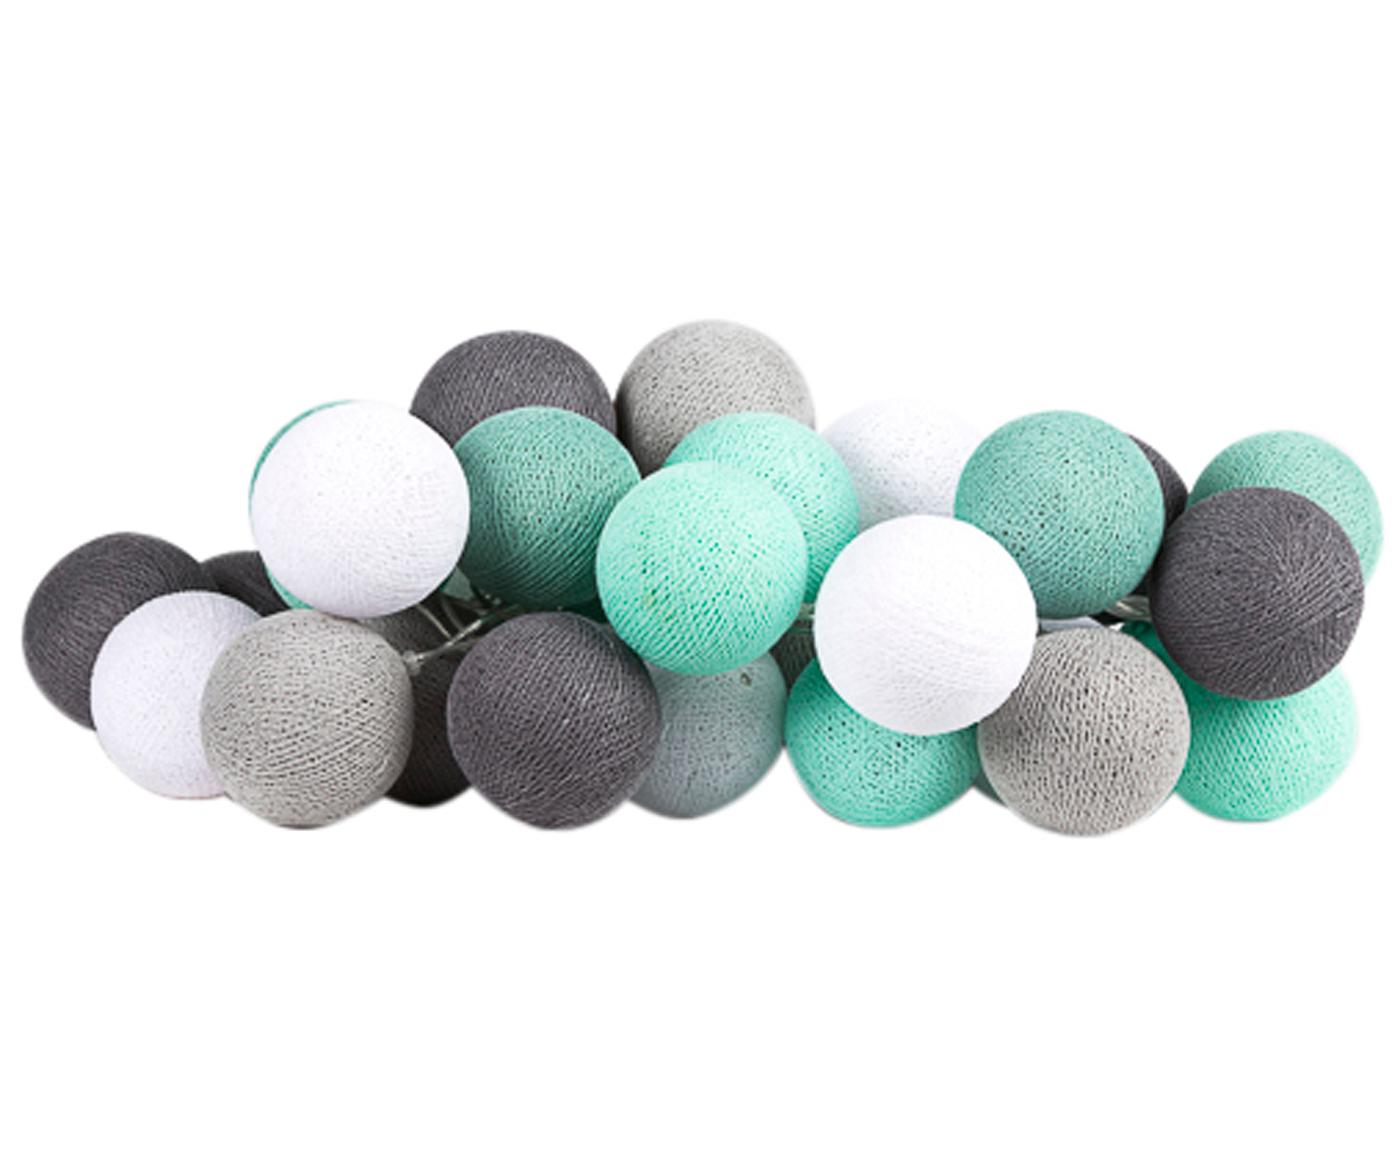 LED Lichterkette Colorain, Lampions: Polyester, Mintgrün, Grautöne, Weiß, L 264 cm